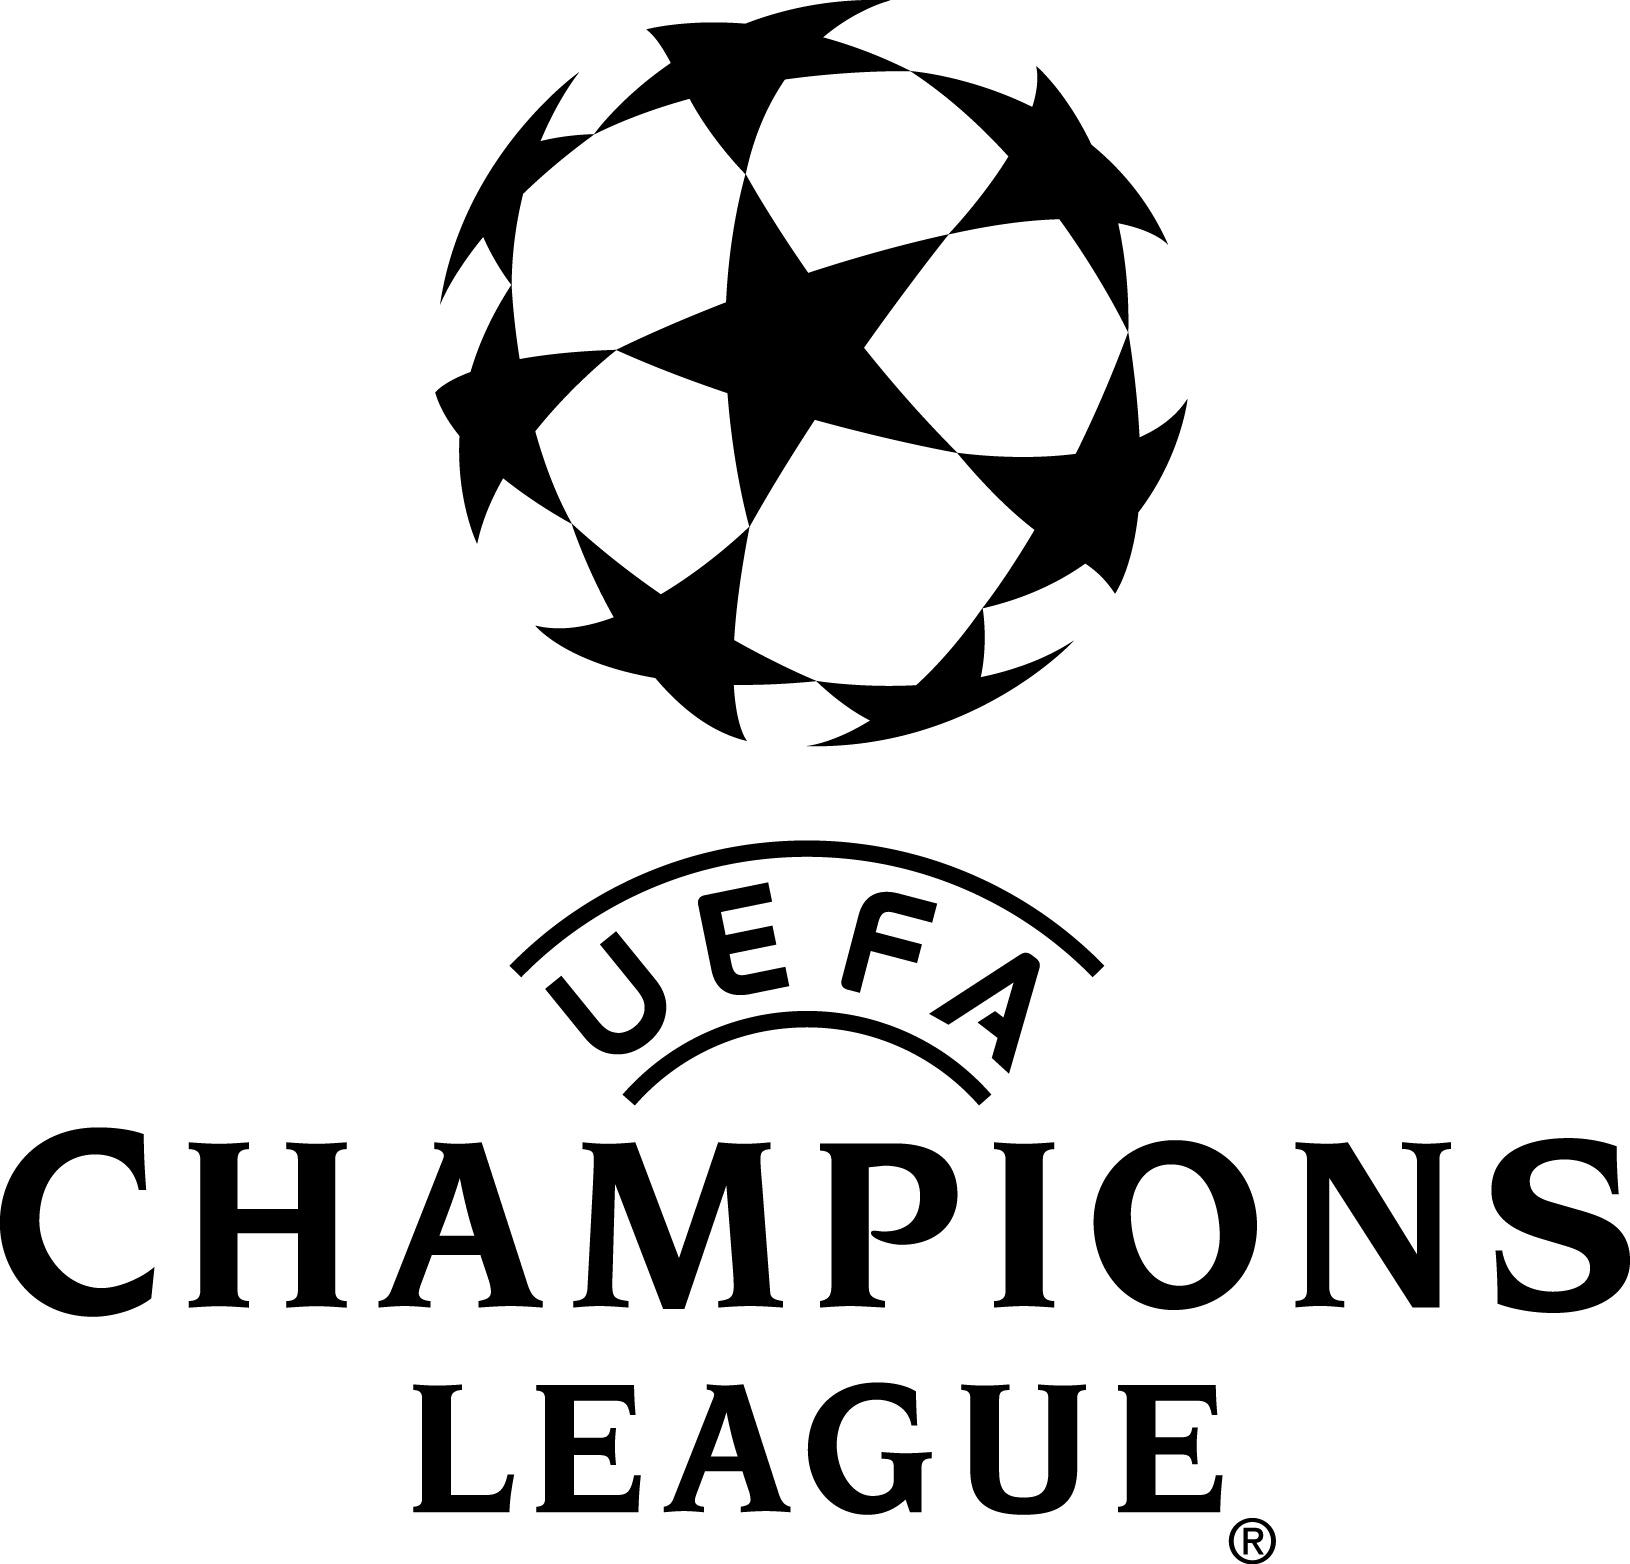 UEFA Champions League logo (classic) - Uefa Europa League Logo PNG